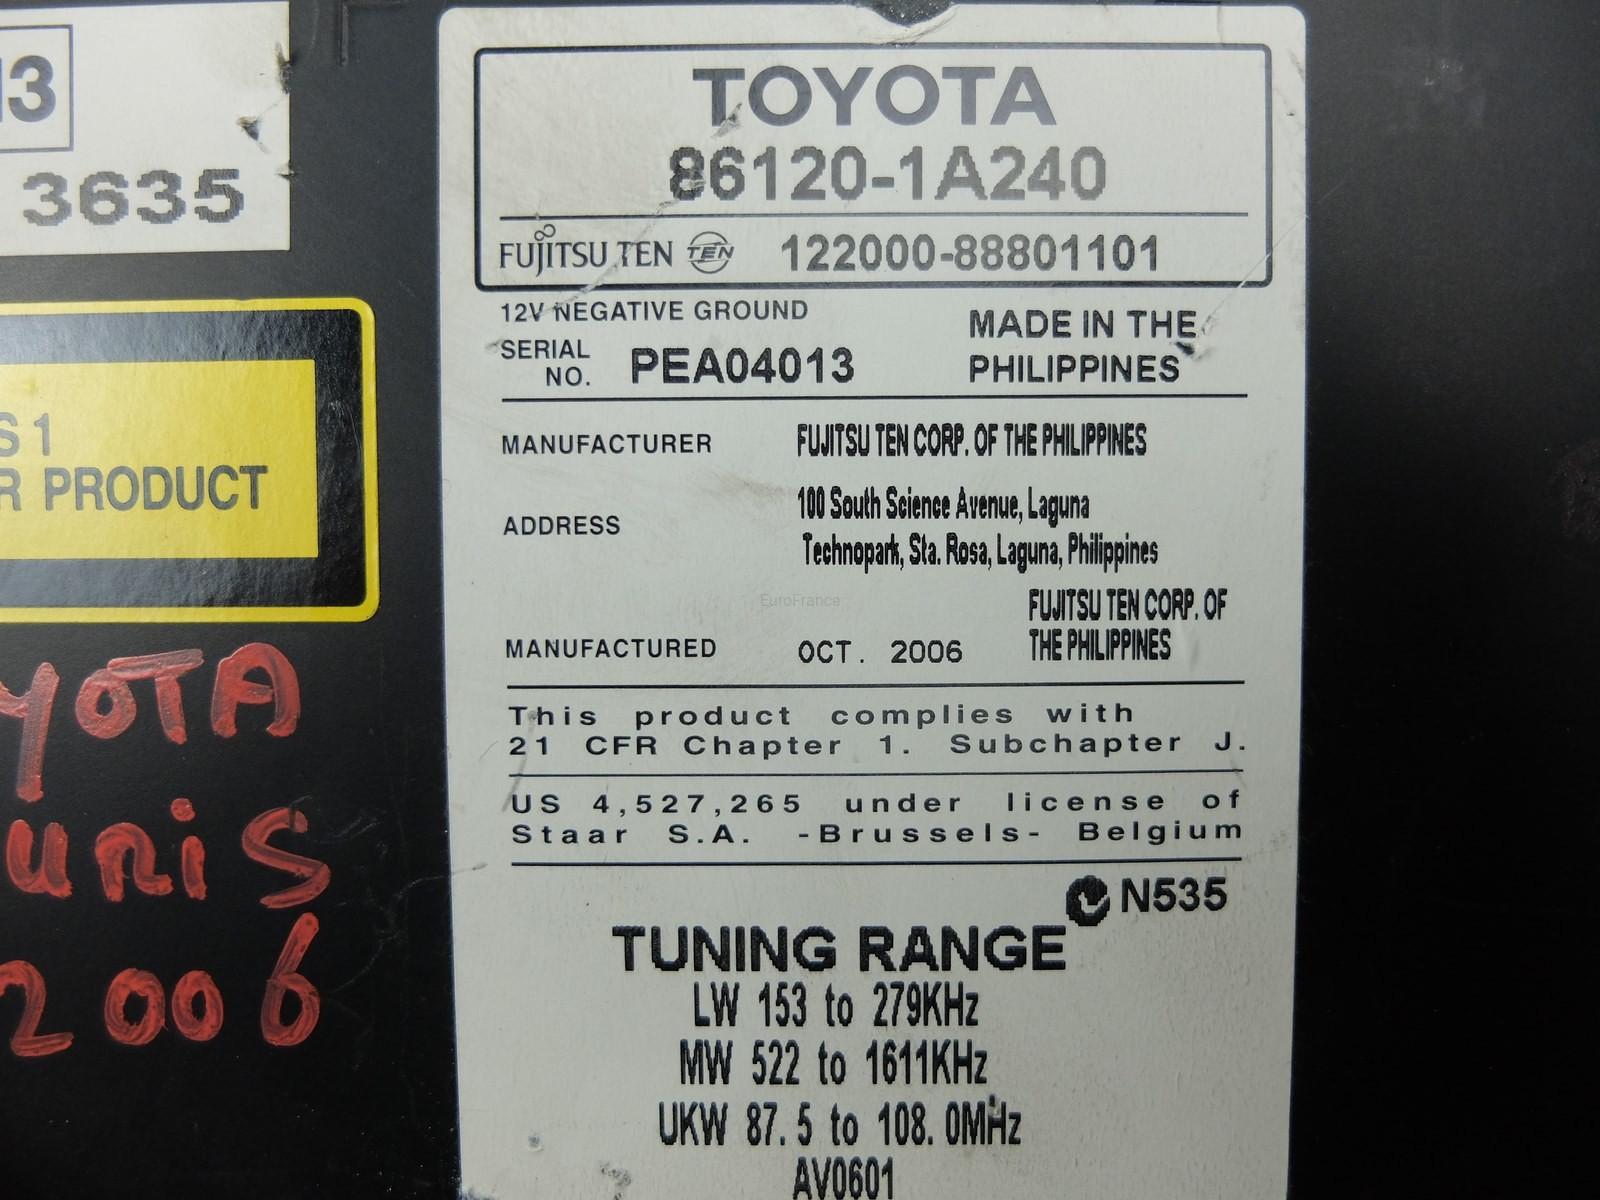 Radio Cd Mp3 Player Toyota Auris 1A240